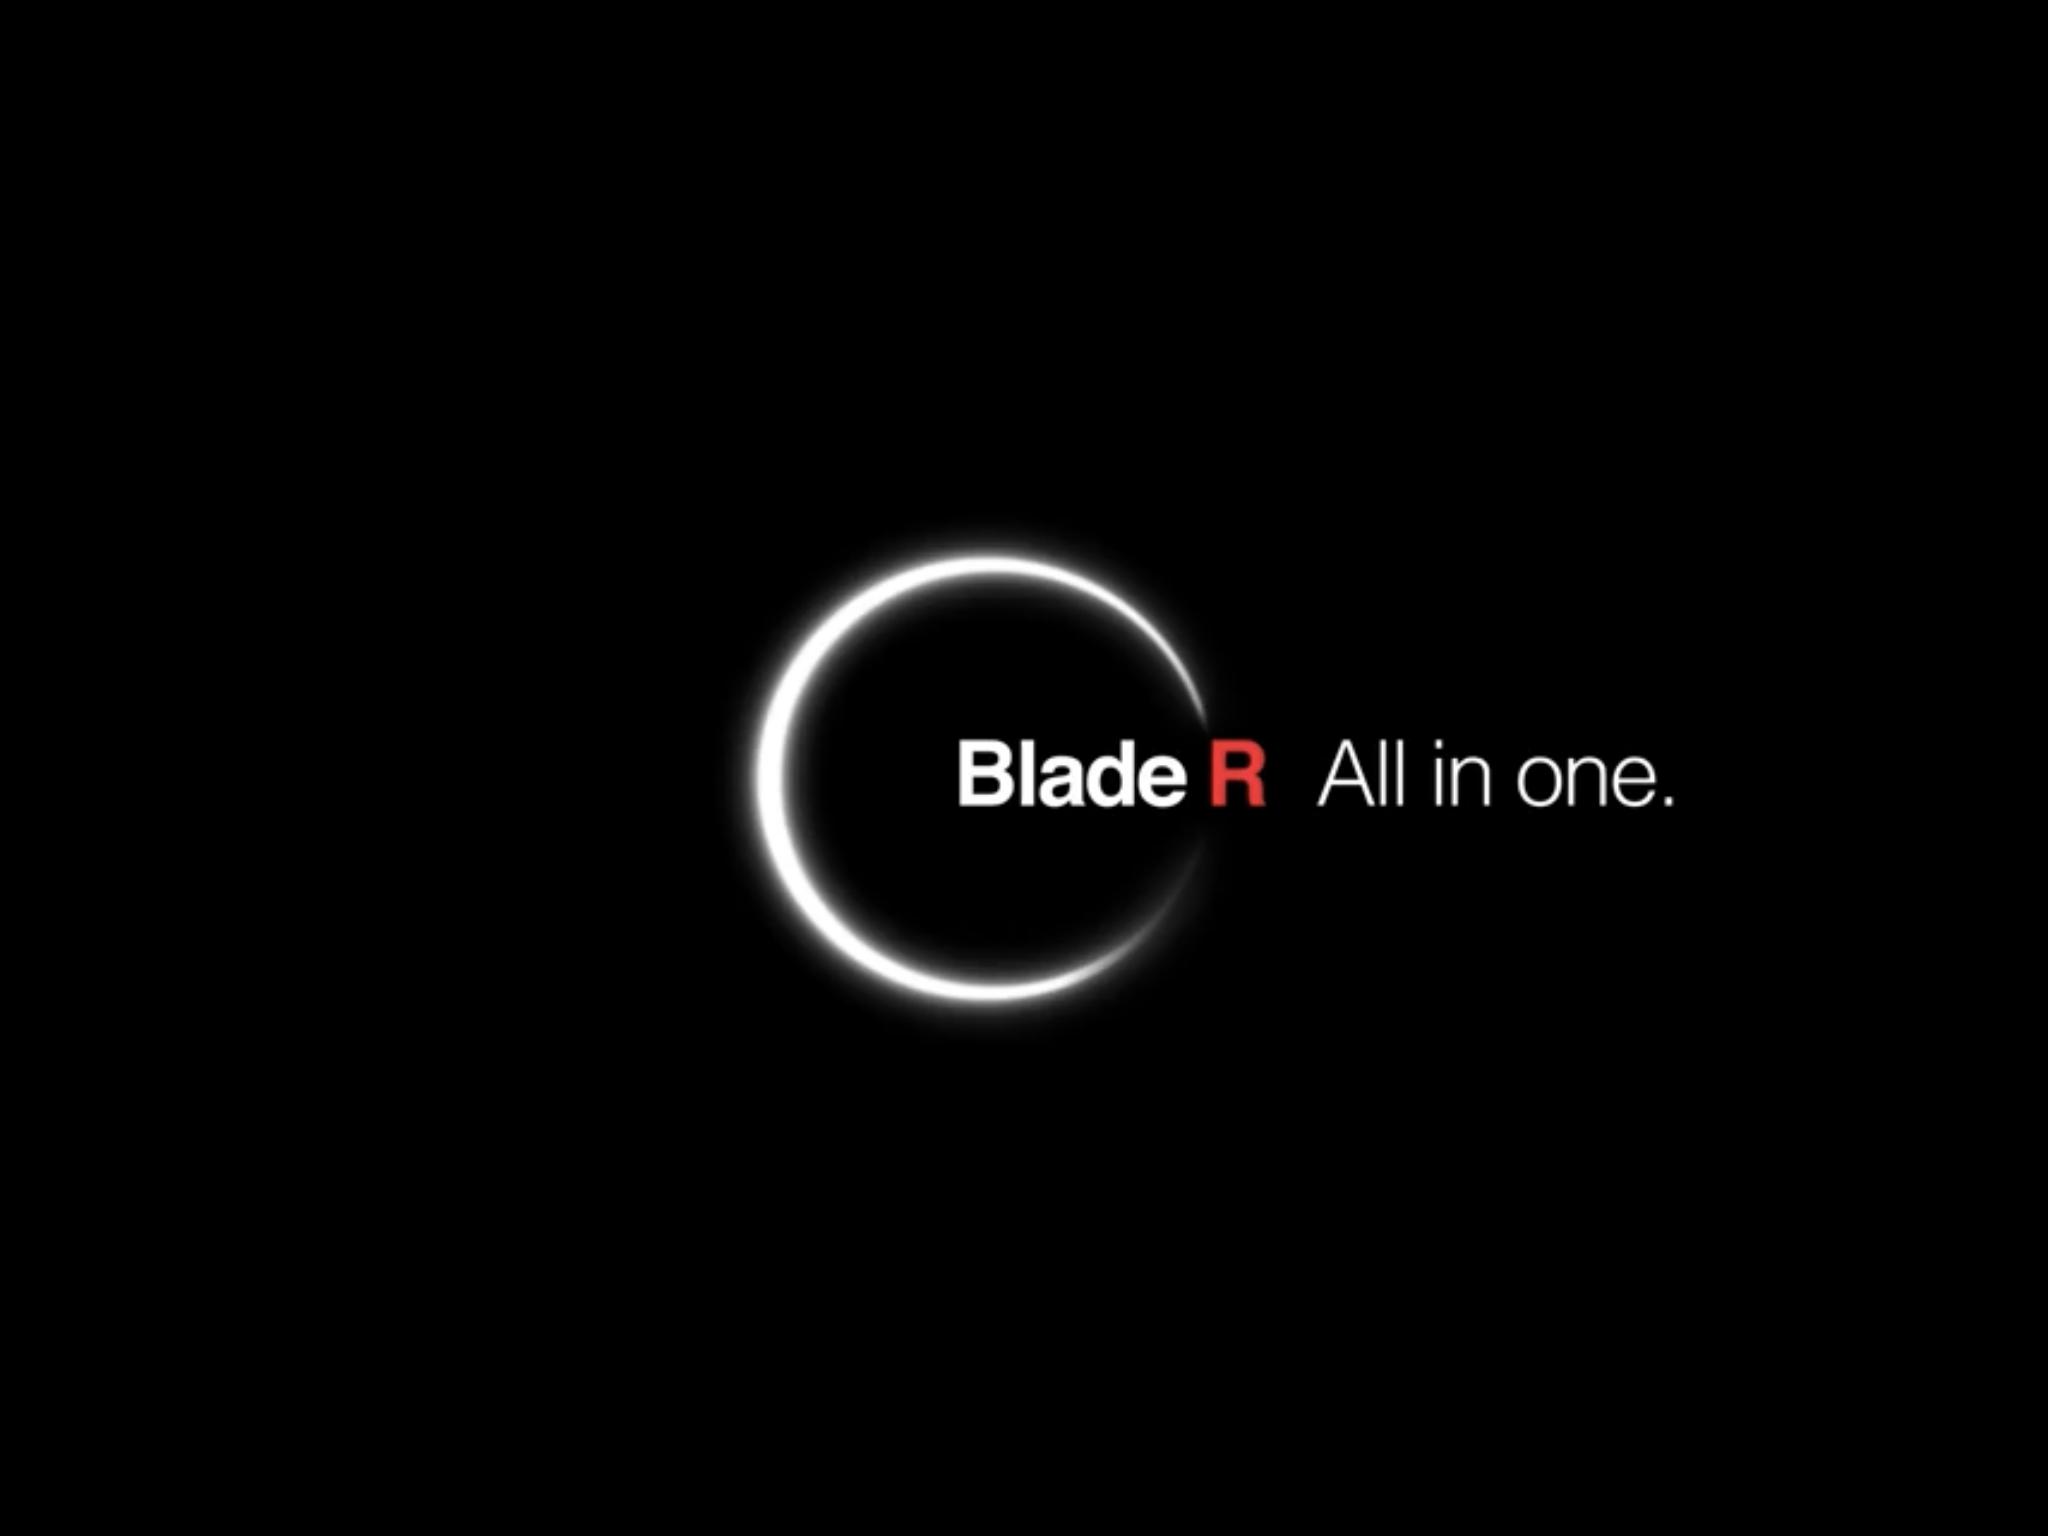 Blade R - iGuzzini